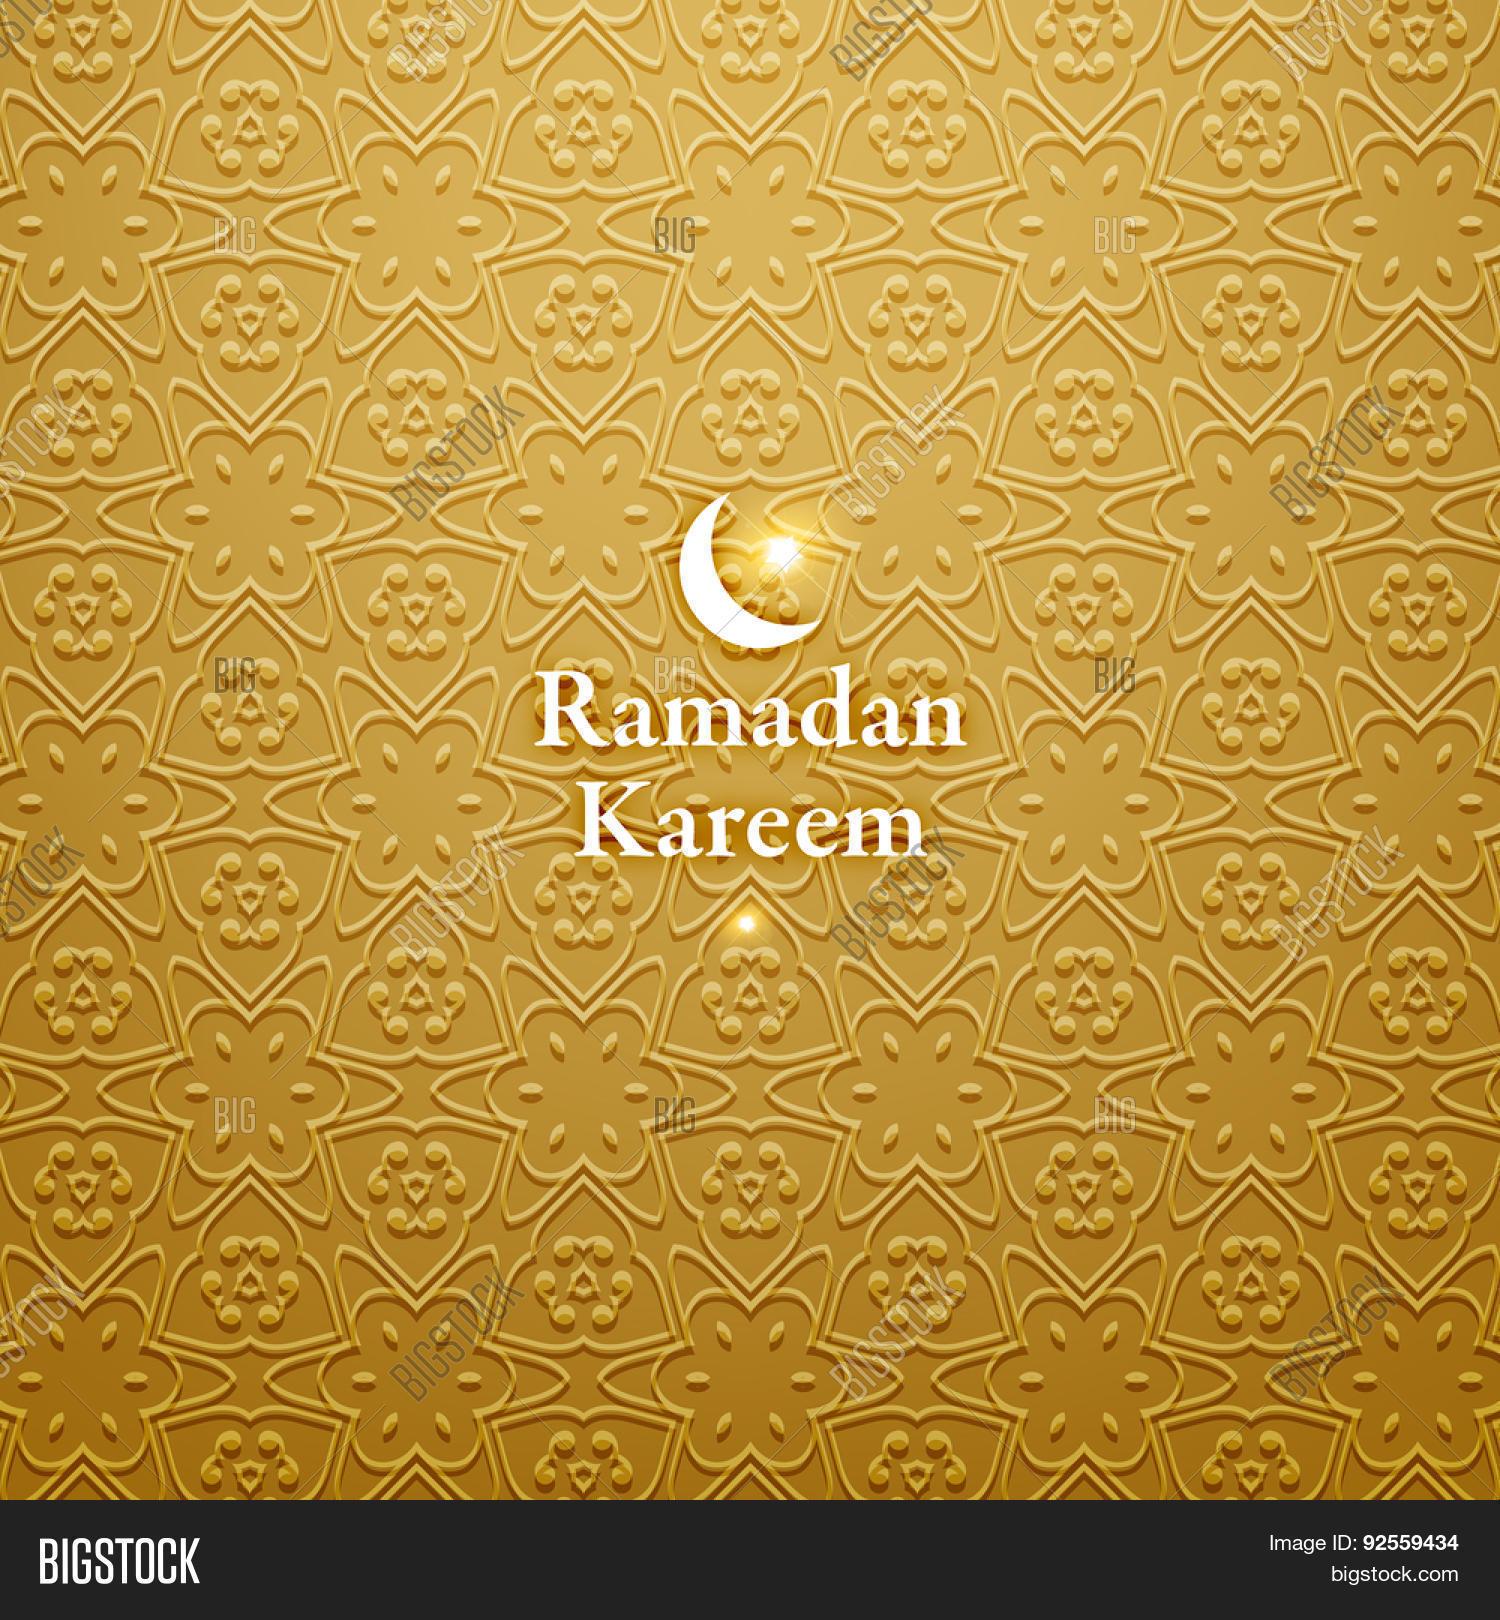 Ramadan kareem ramadan greeting vector photo bigstock ramadan greeting card background muslim seamless pattern holiday design kristyandbryce Choice Image